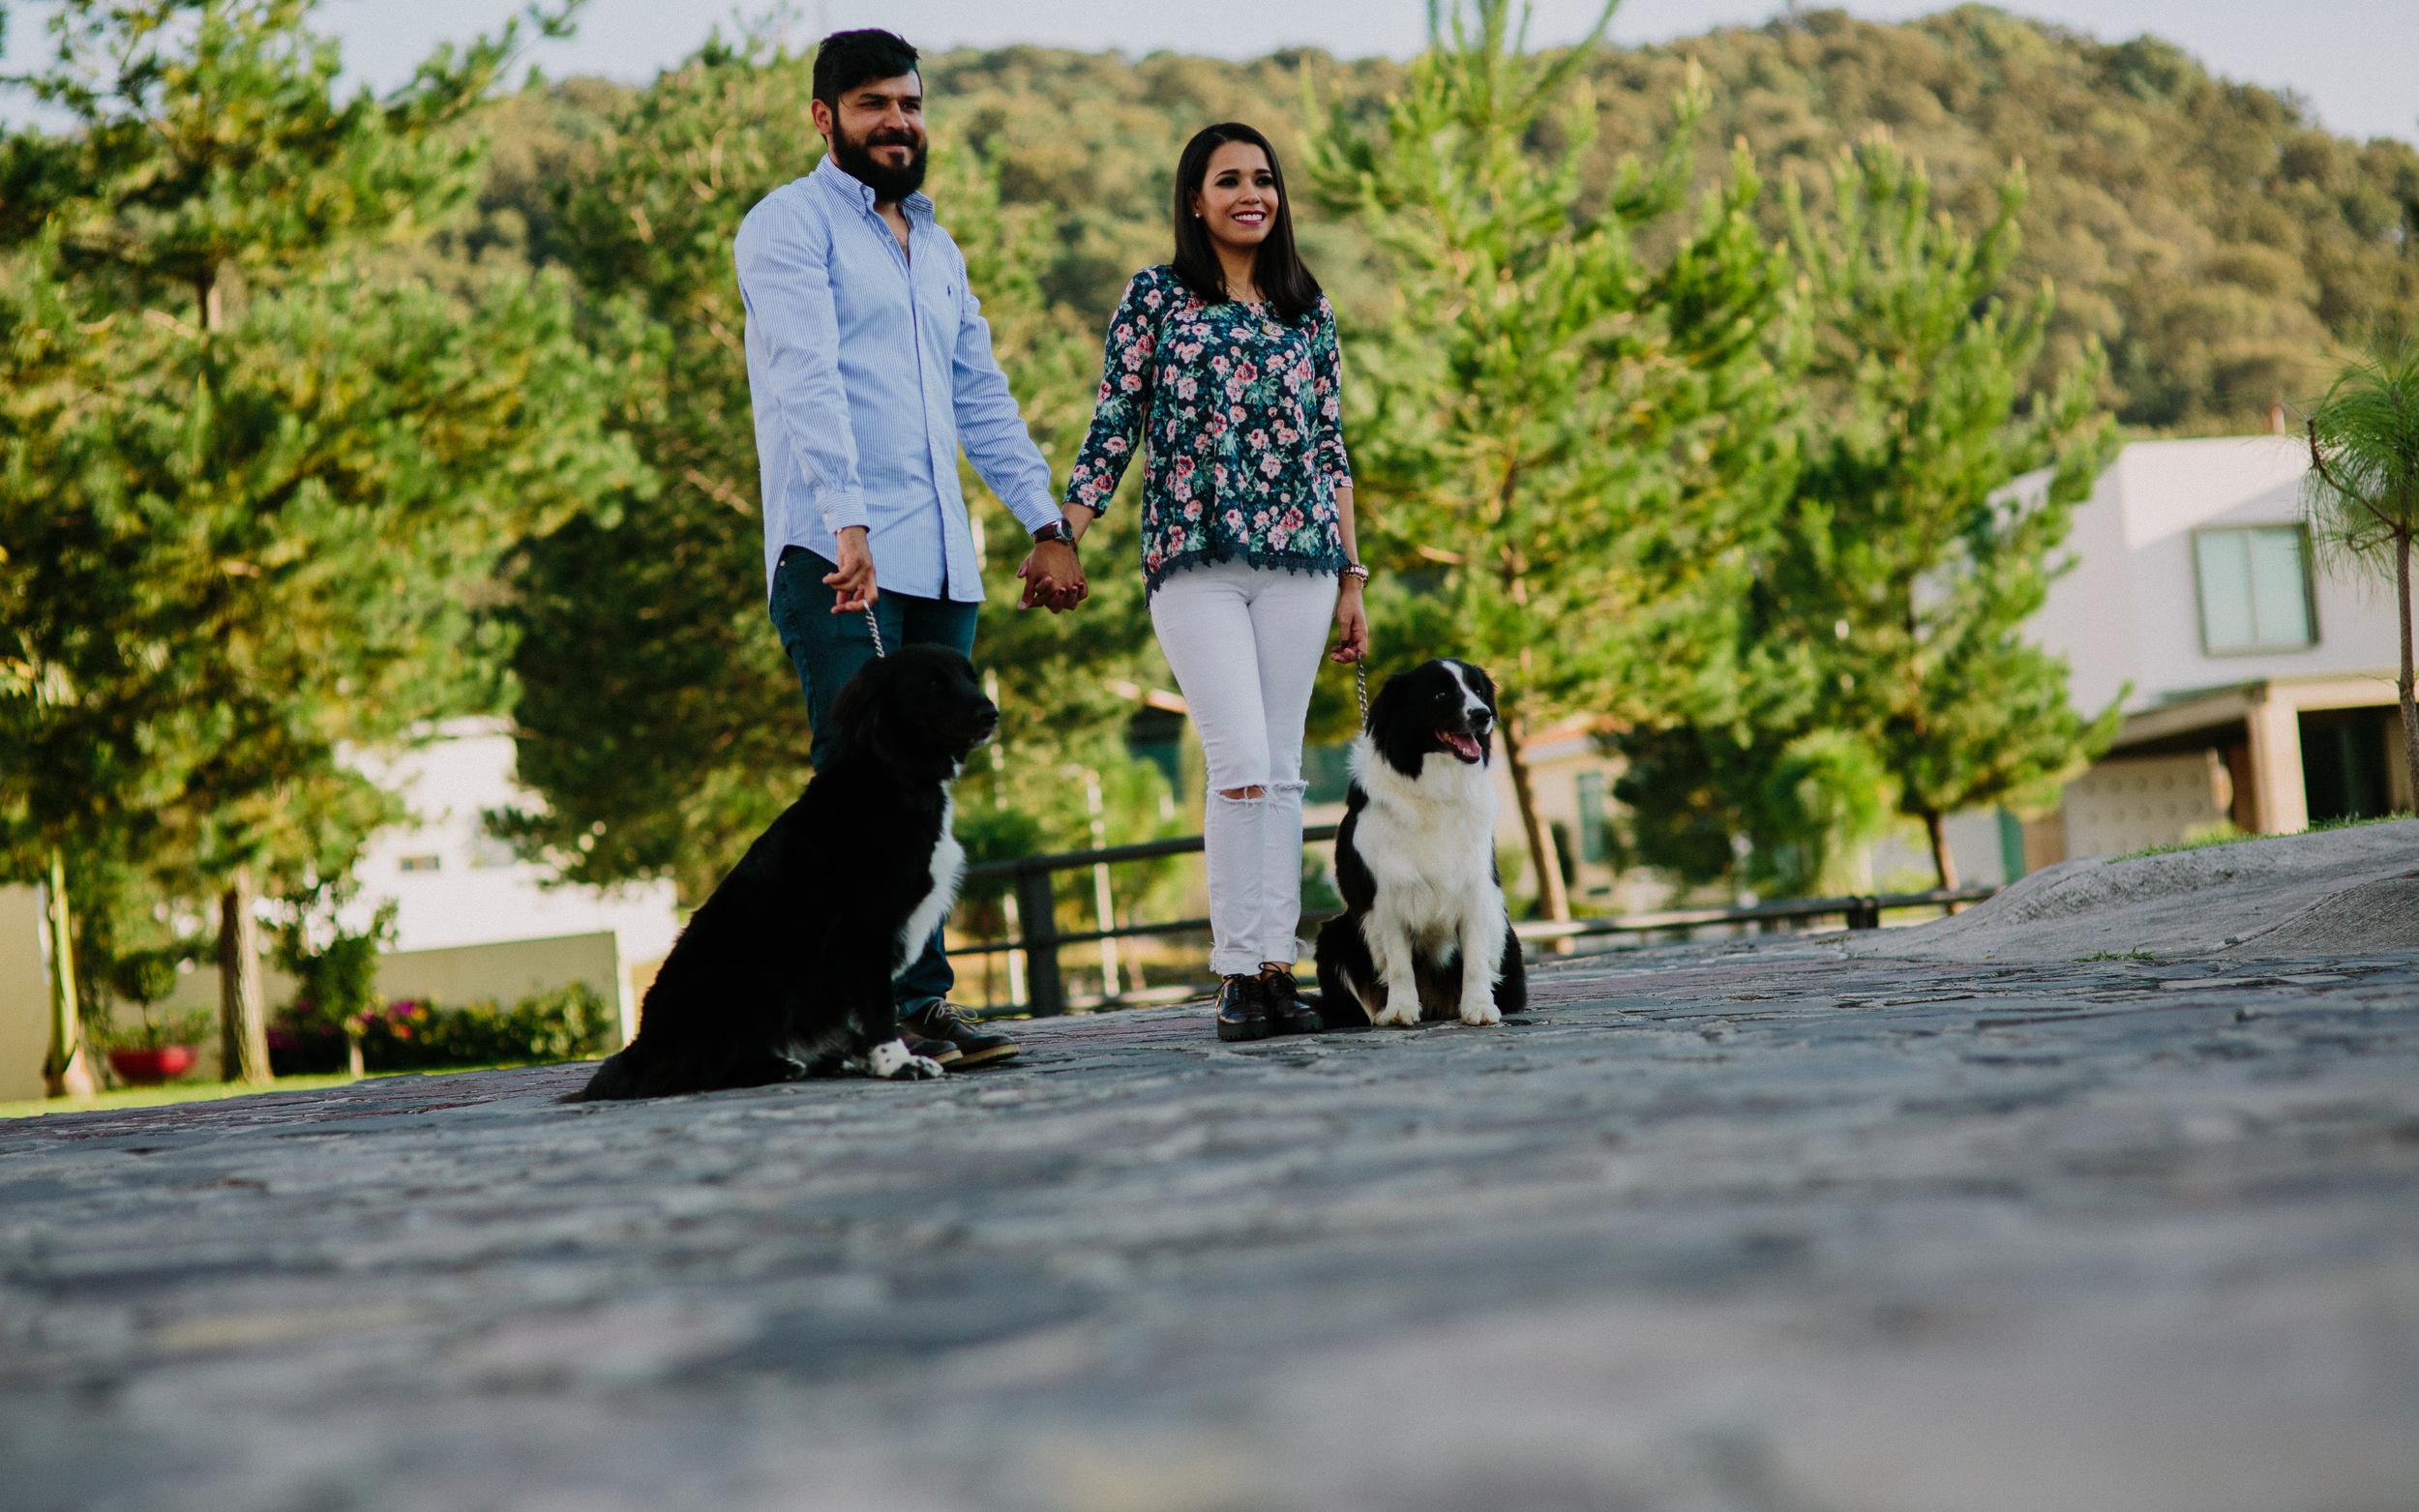 hellosolphoto-savethedate-fotogrfia de boda guadalajara-mascotas1